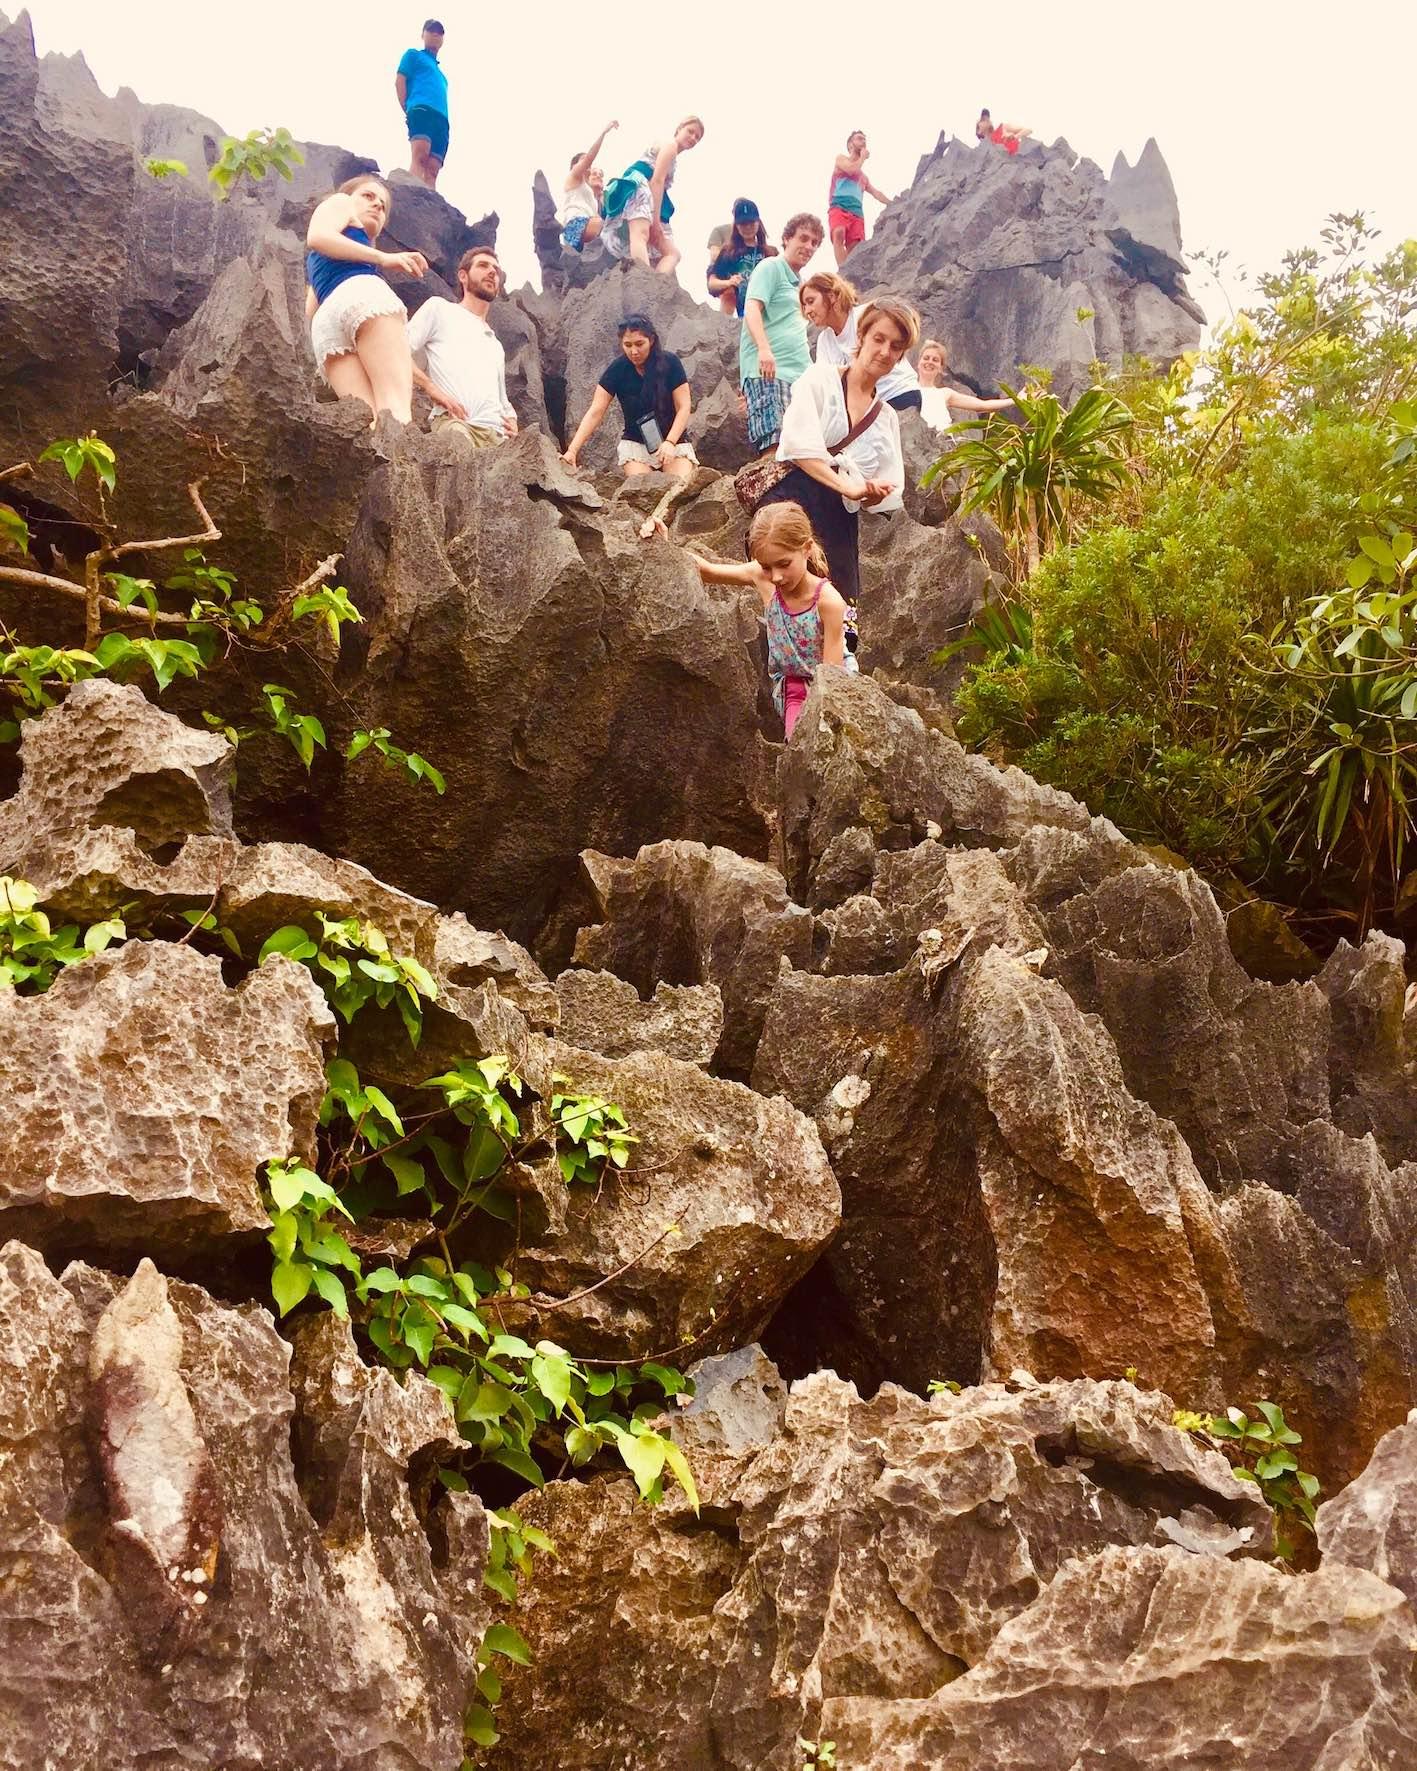 Hiking on Monkey Island in Halong Bay Vietnam